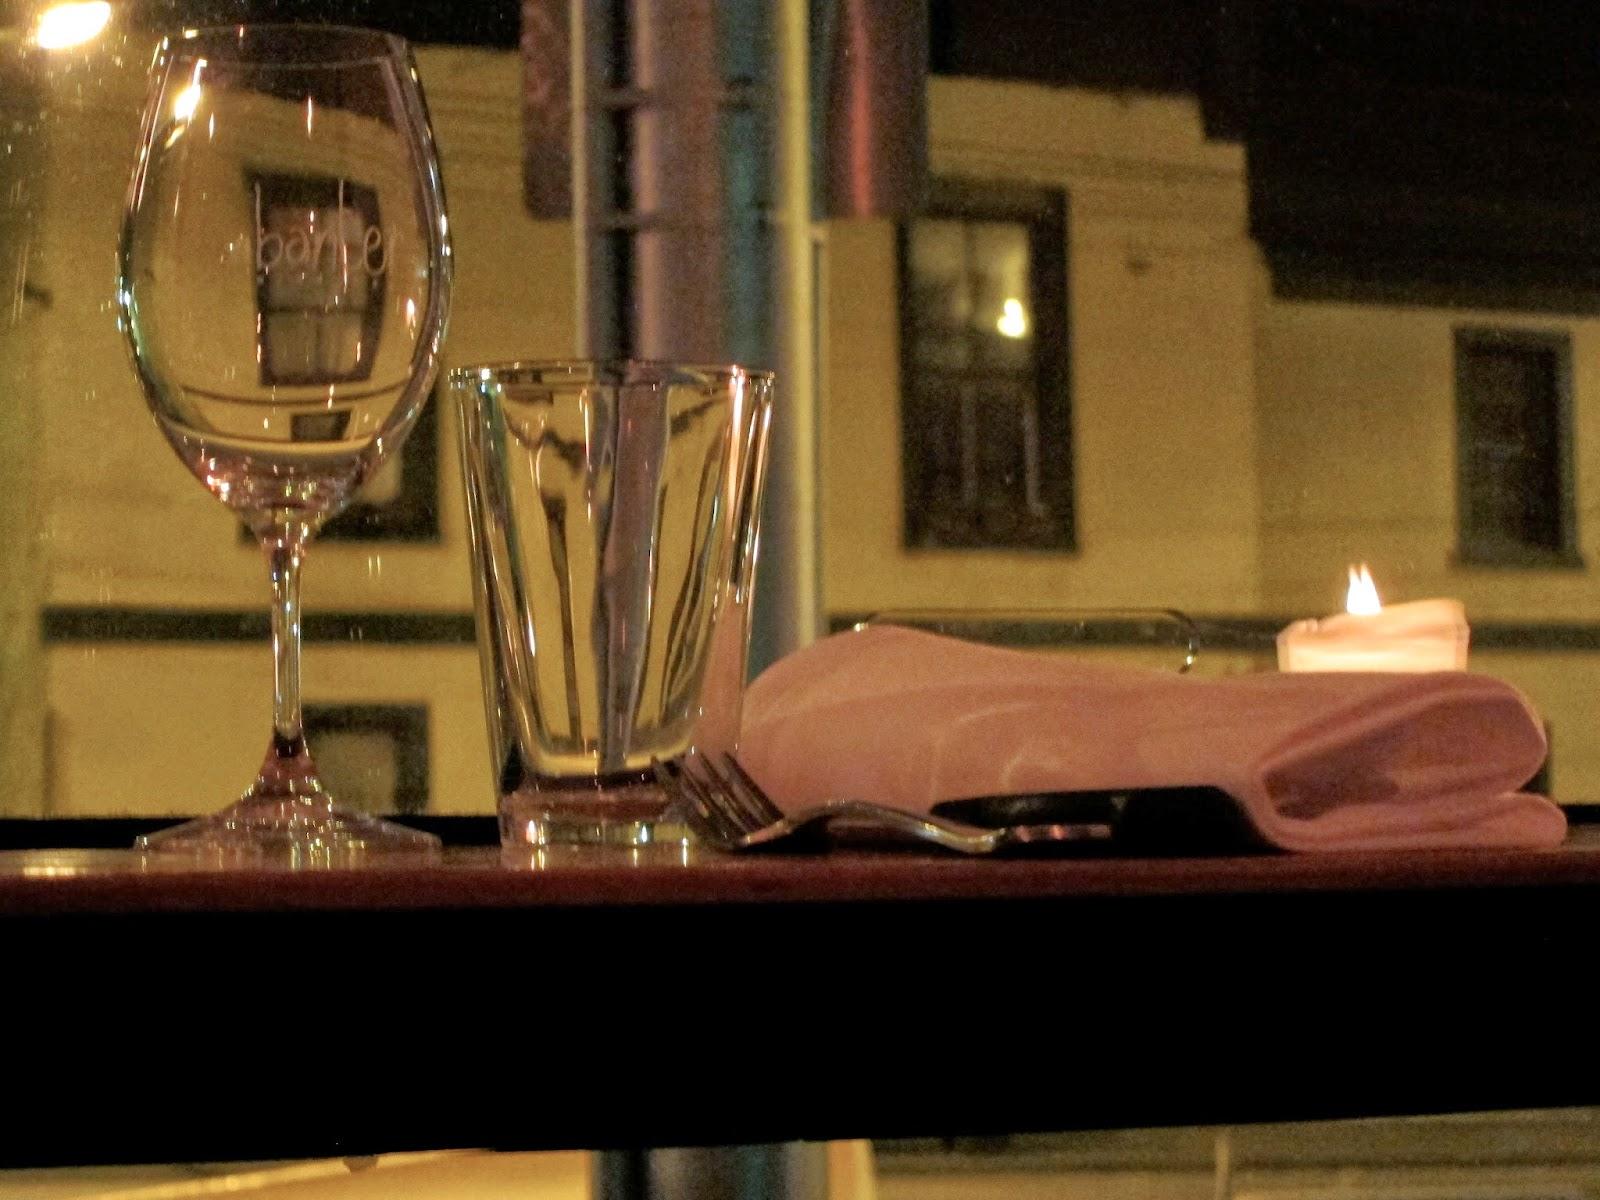 banter wine bar window view